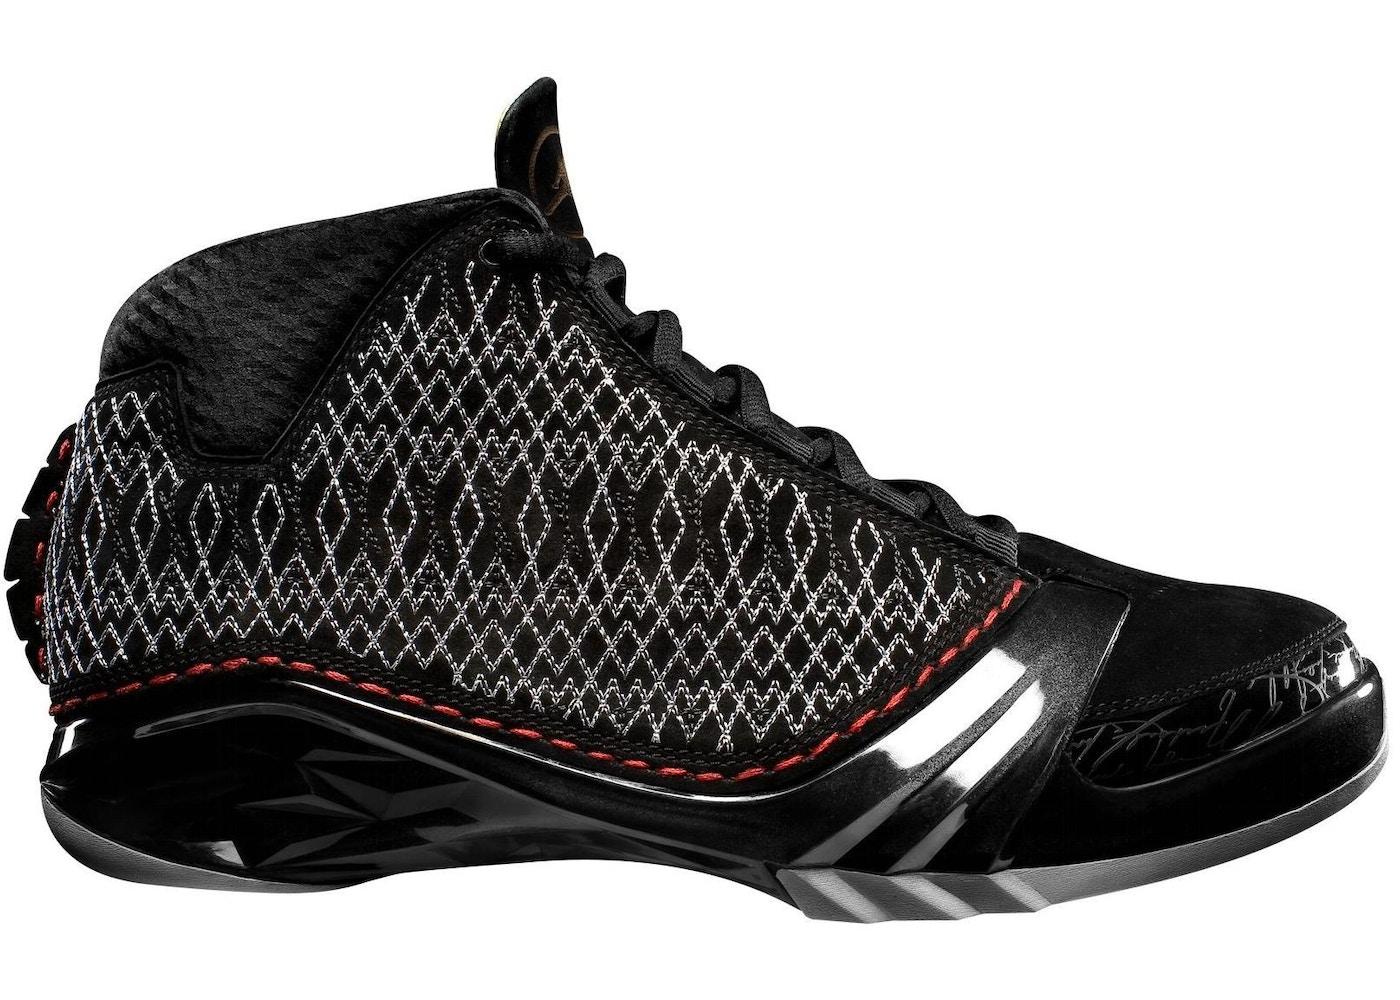 d0b75c834b34 Jordan 23 Black Stealth - 318376-001